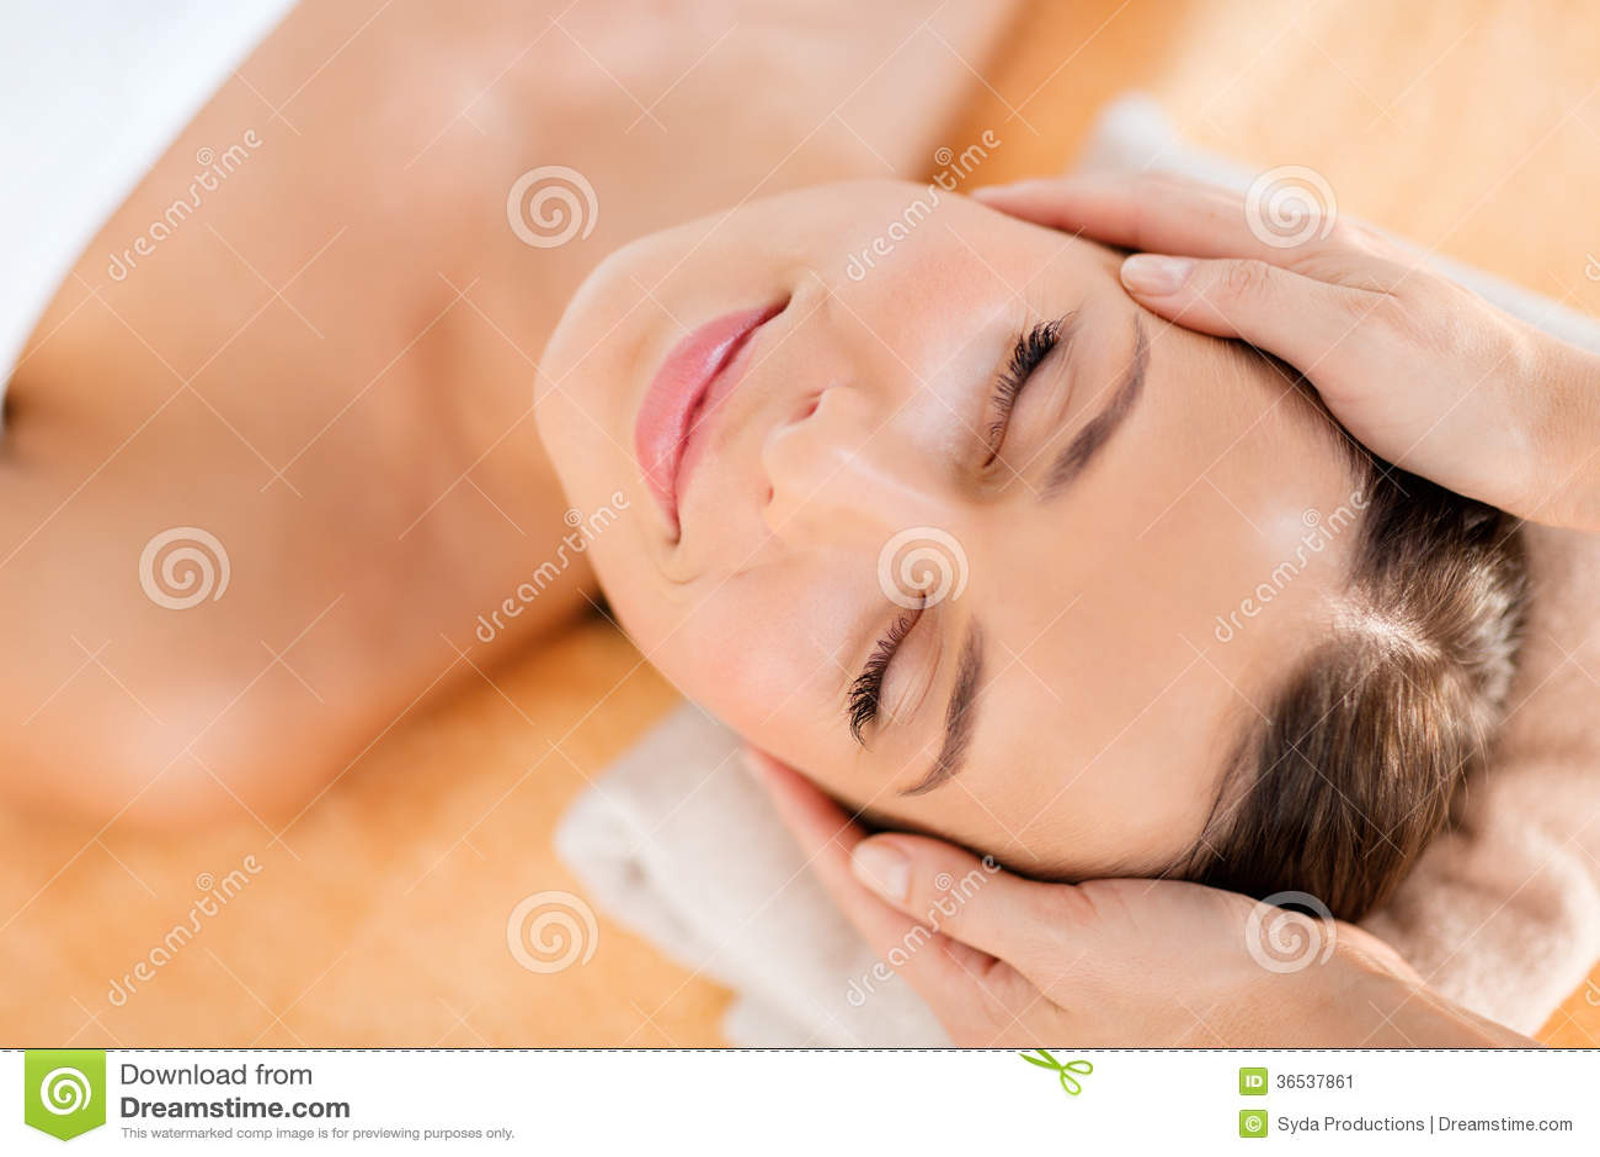 beautiful woman in spa salon stock image image 36537861. Black Bedroom Furniture Sets. Home Design Ideas